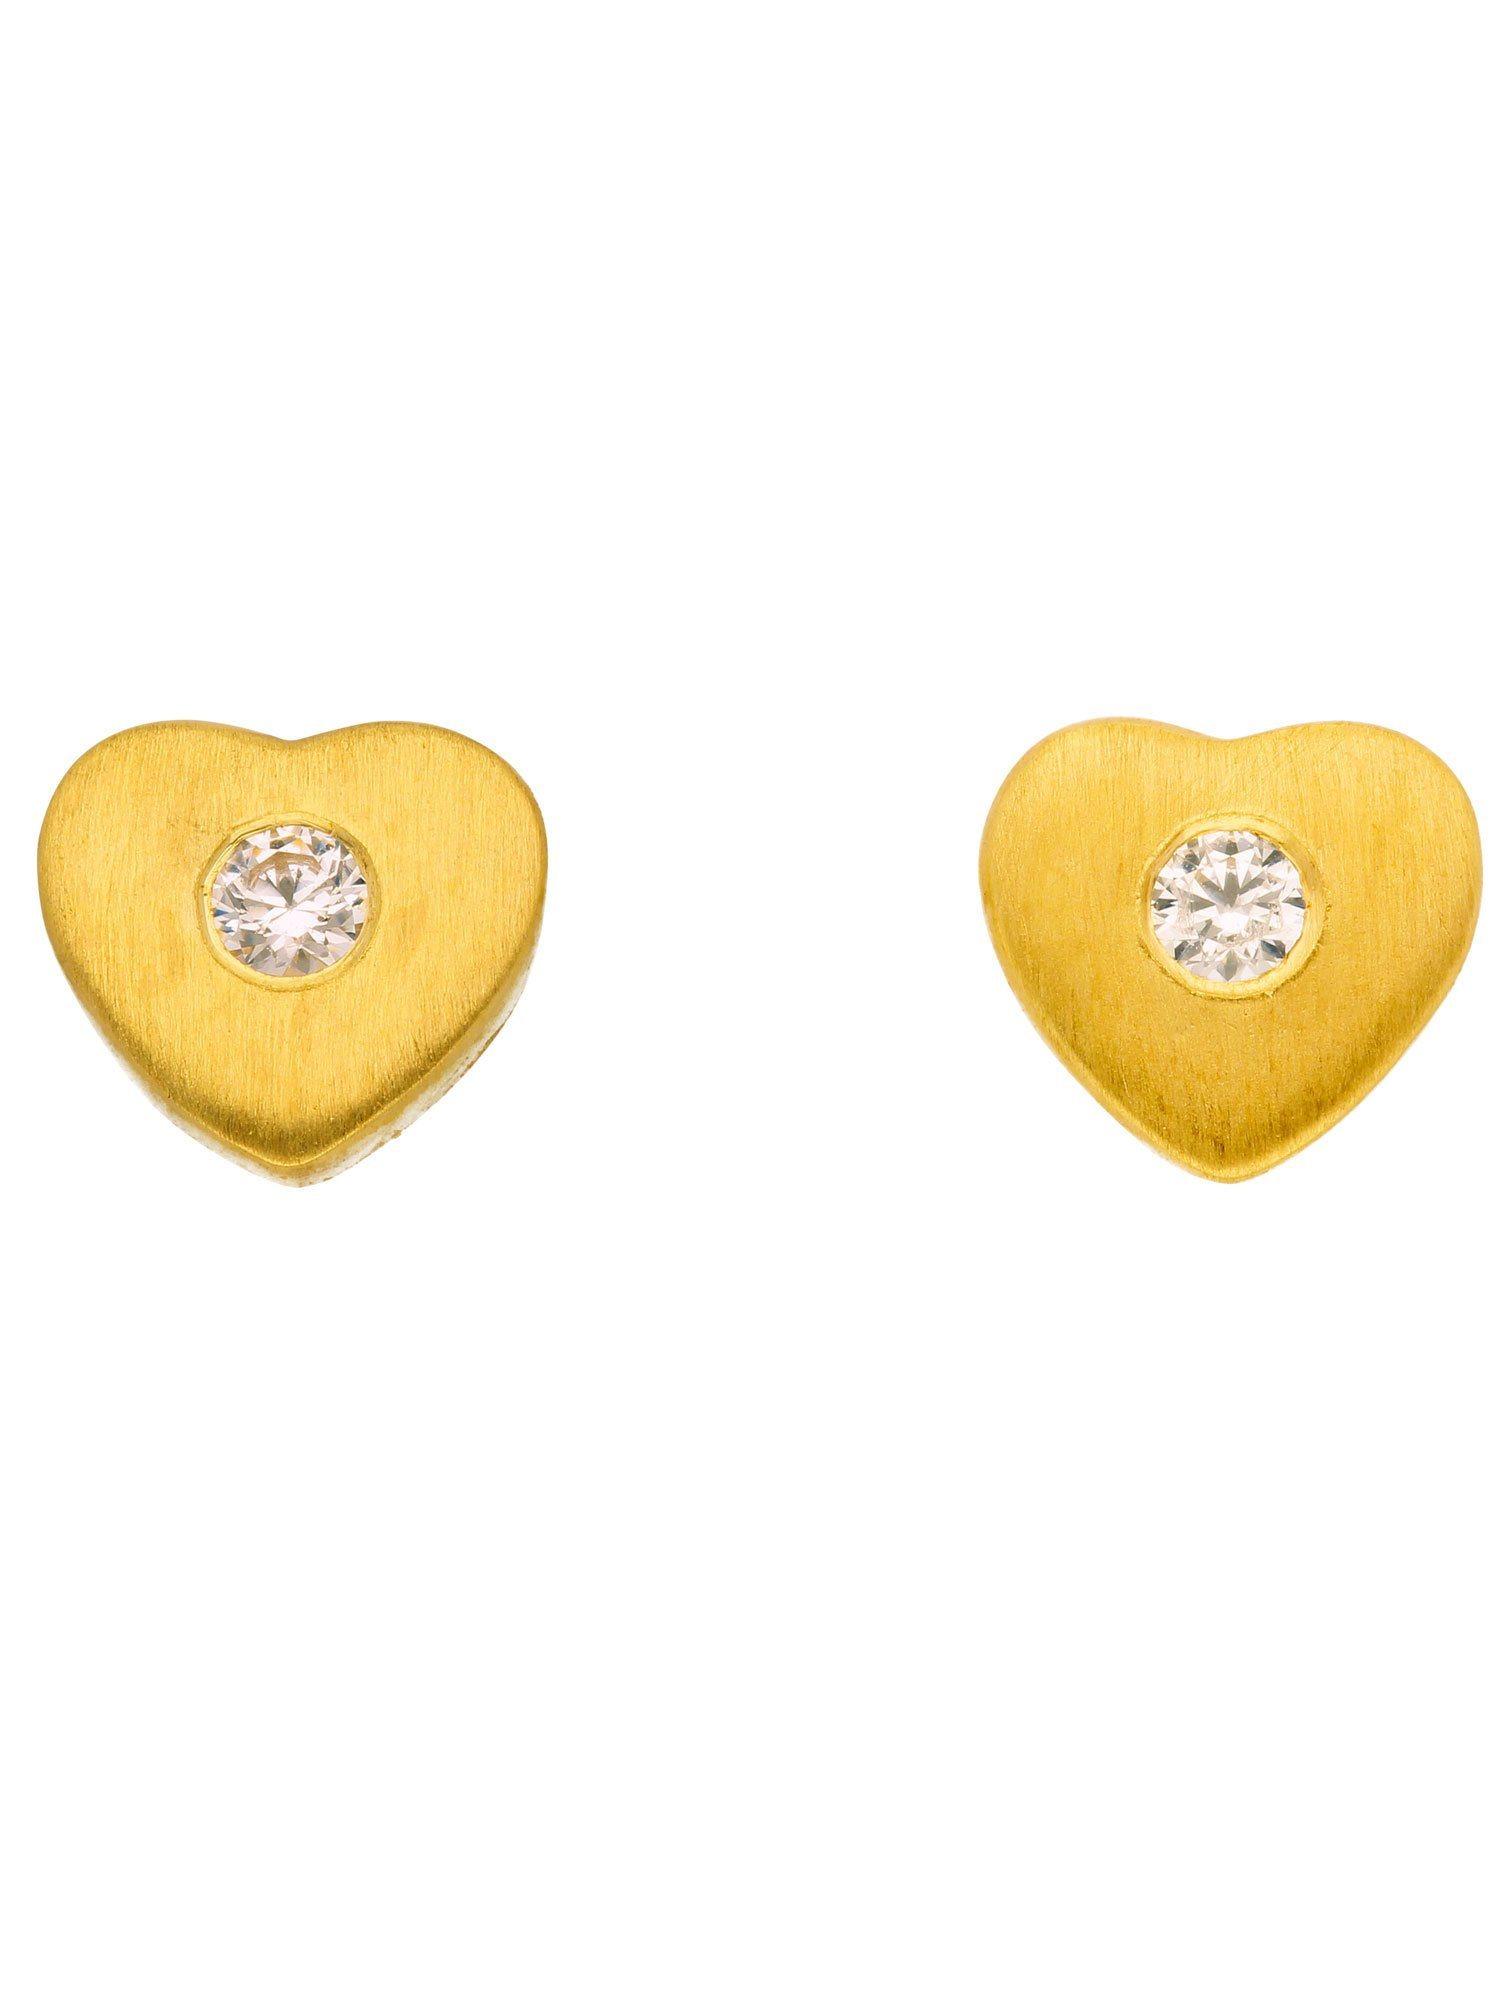 Adelia´s Paar Ohrstecker »Gold Ohrringe« 8 k 333 Gelbgold mit Zirkonia | Schmuck > Ohrschmuck & Ohrringe > Ohrstecker | Goldfarben | Adelia´s